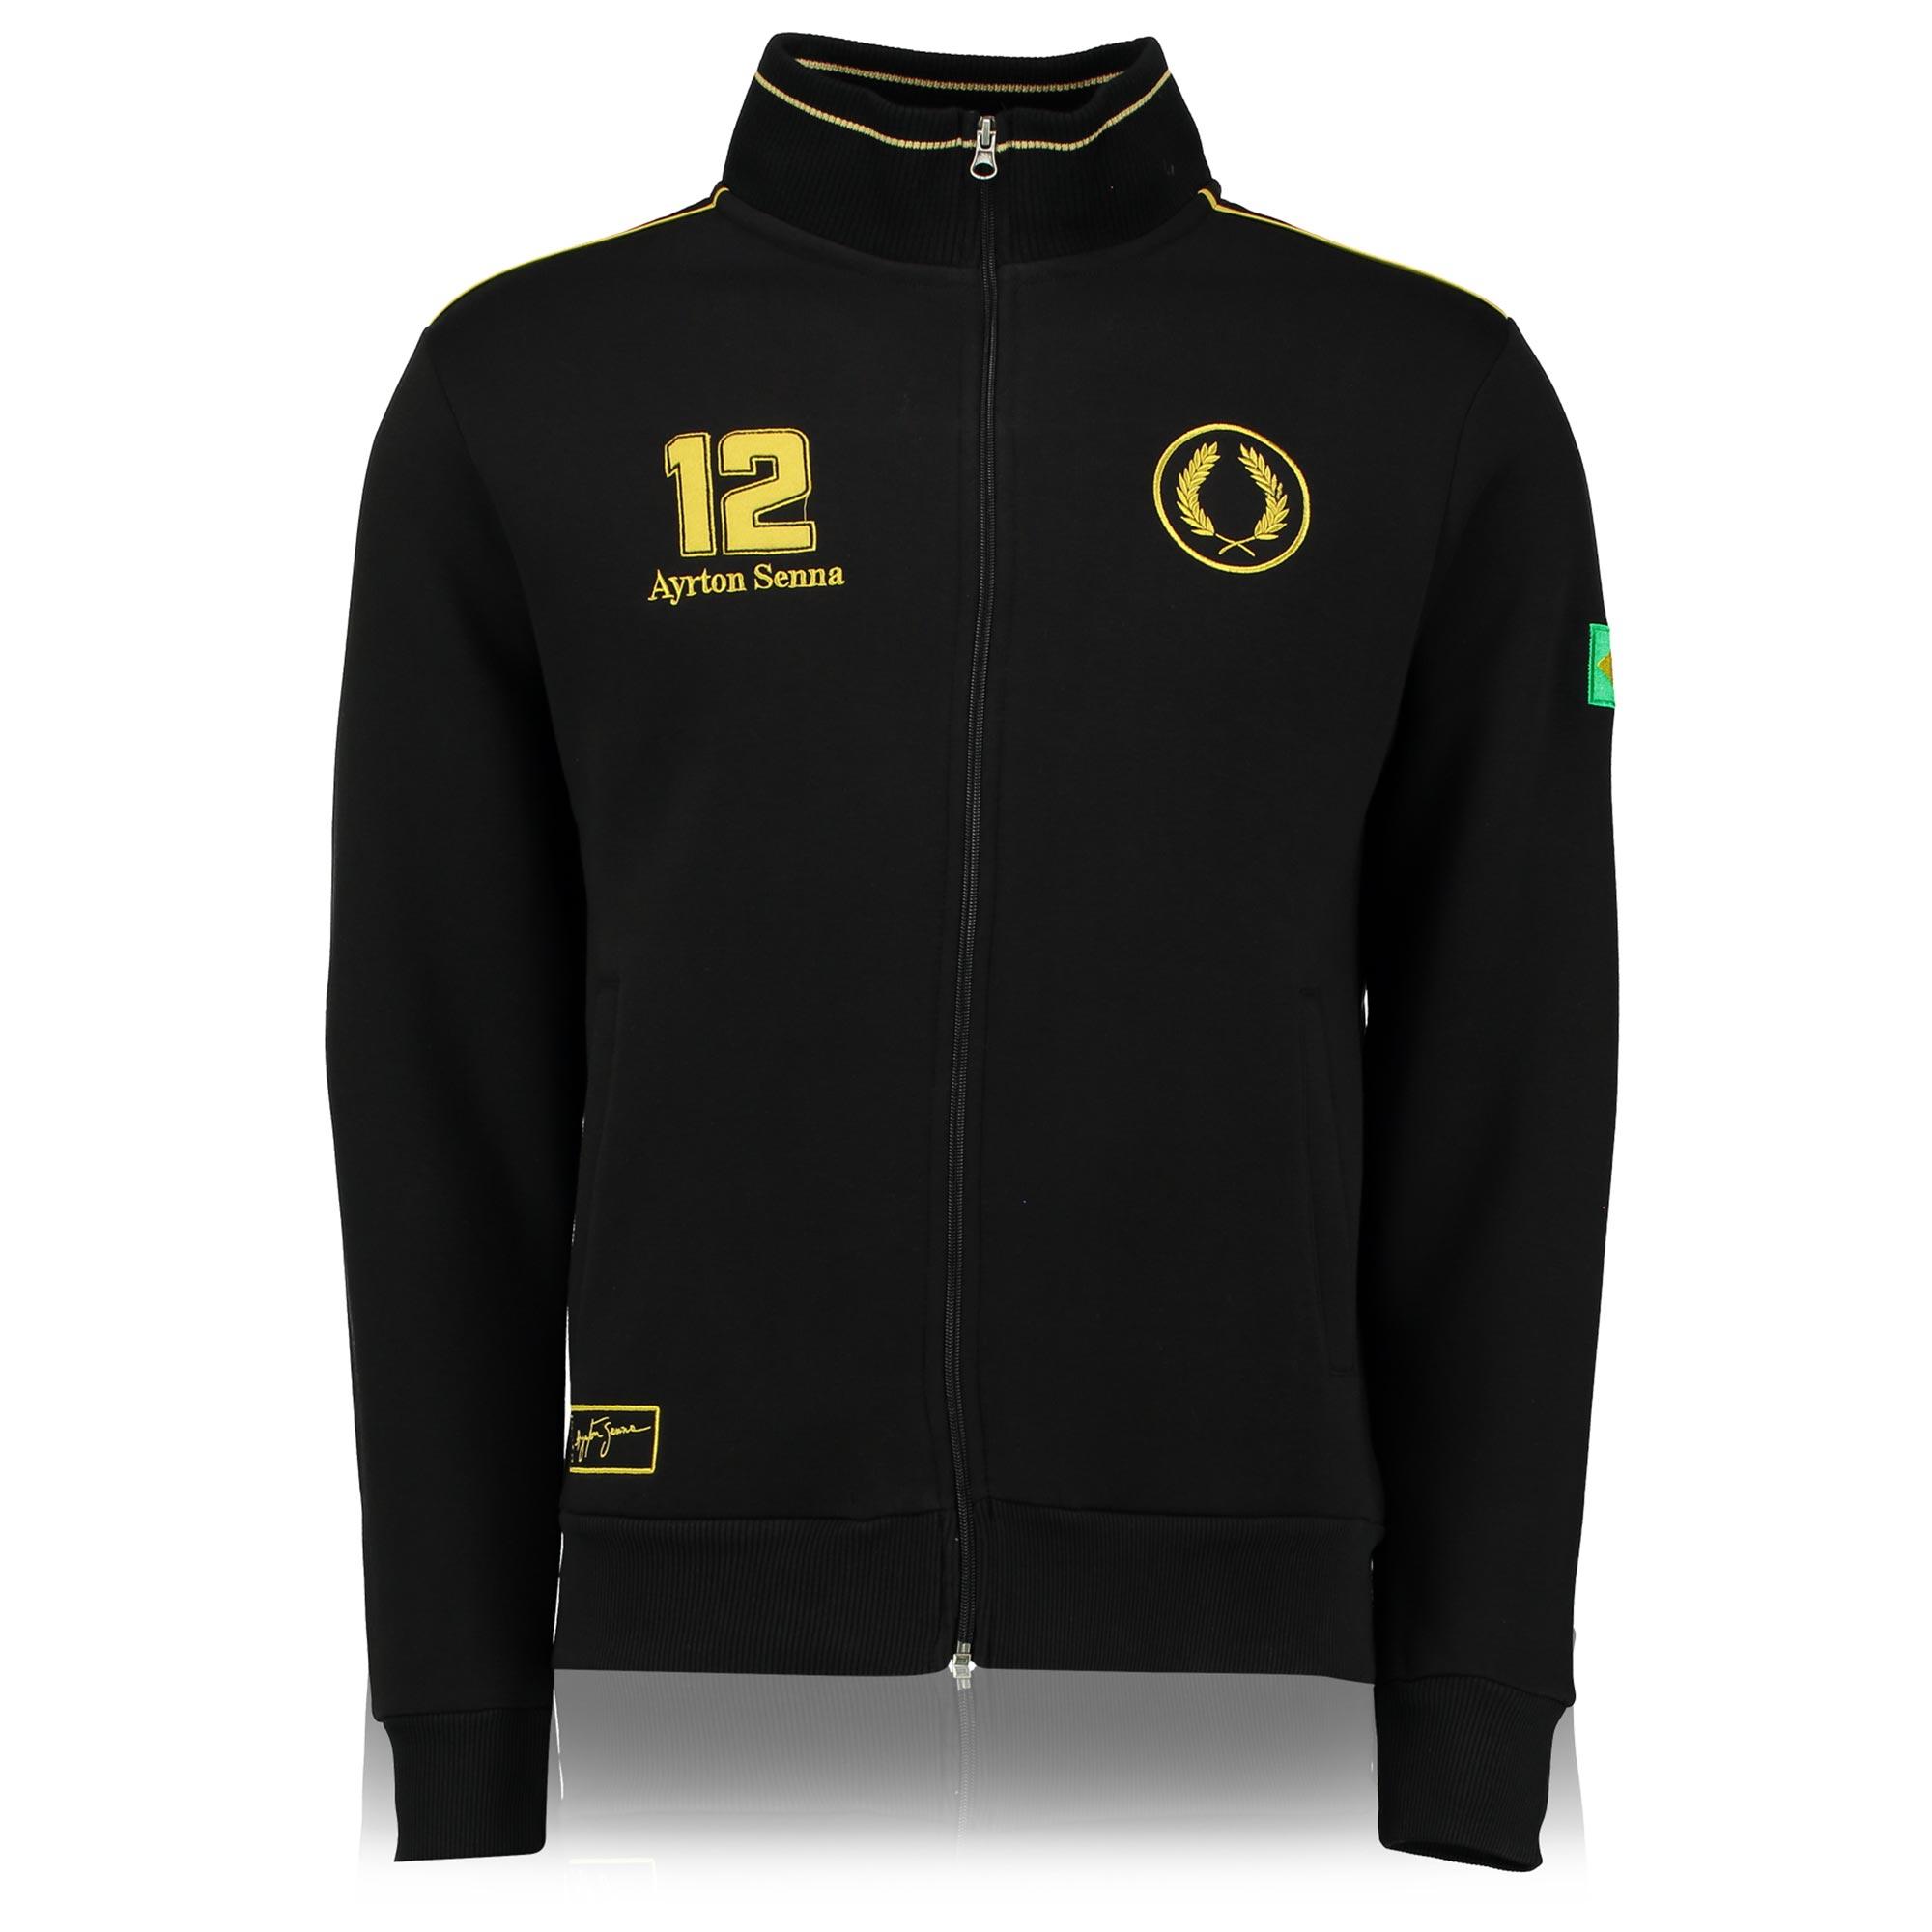 Image of Ayrton Senna Classic Team Lotus Sweat Jacket